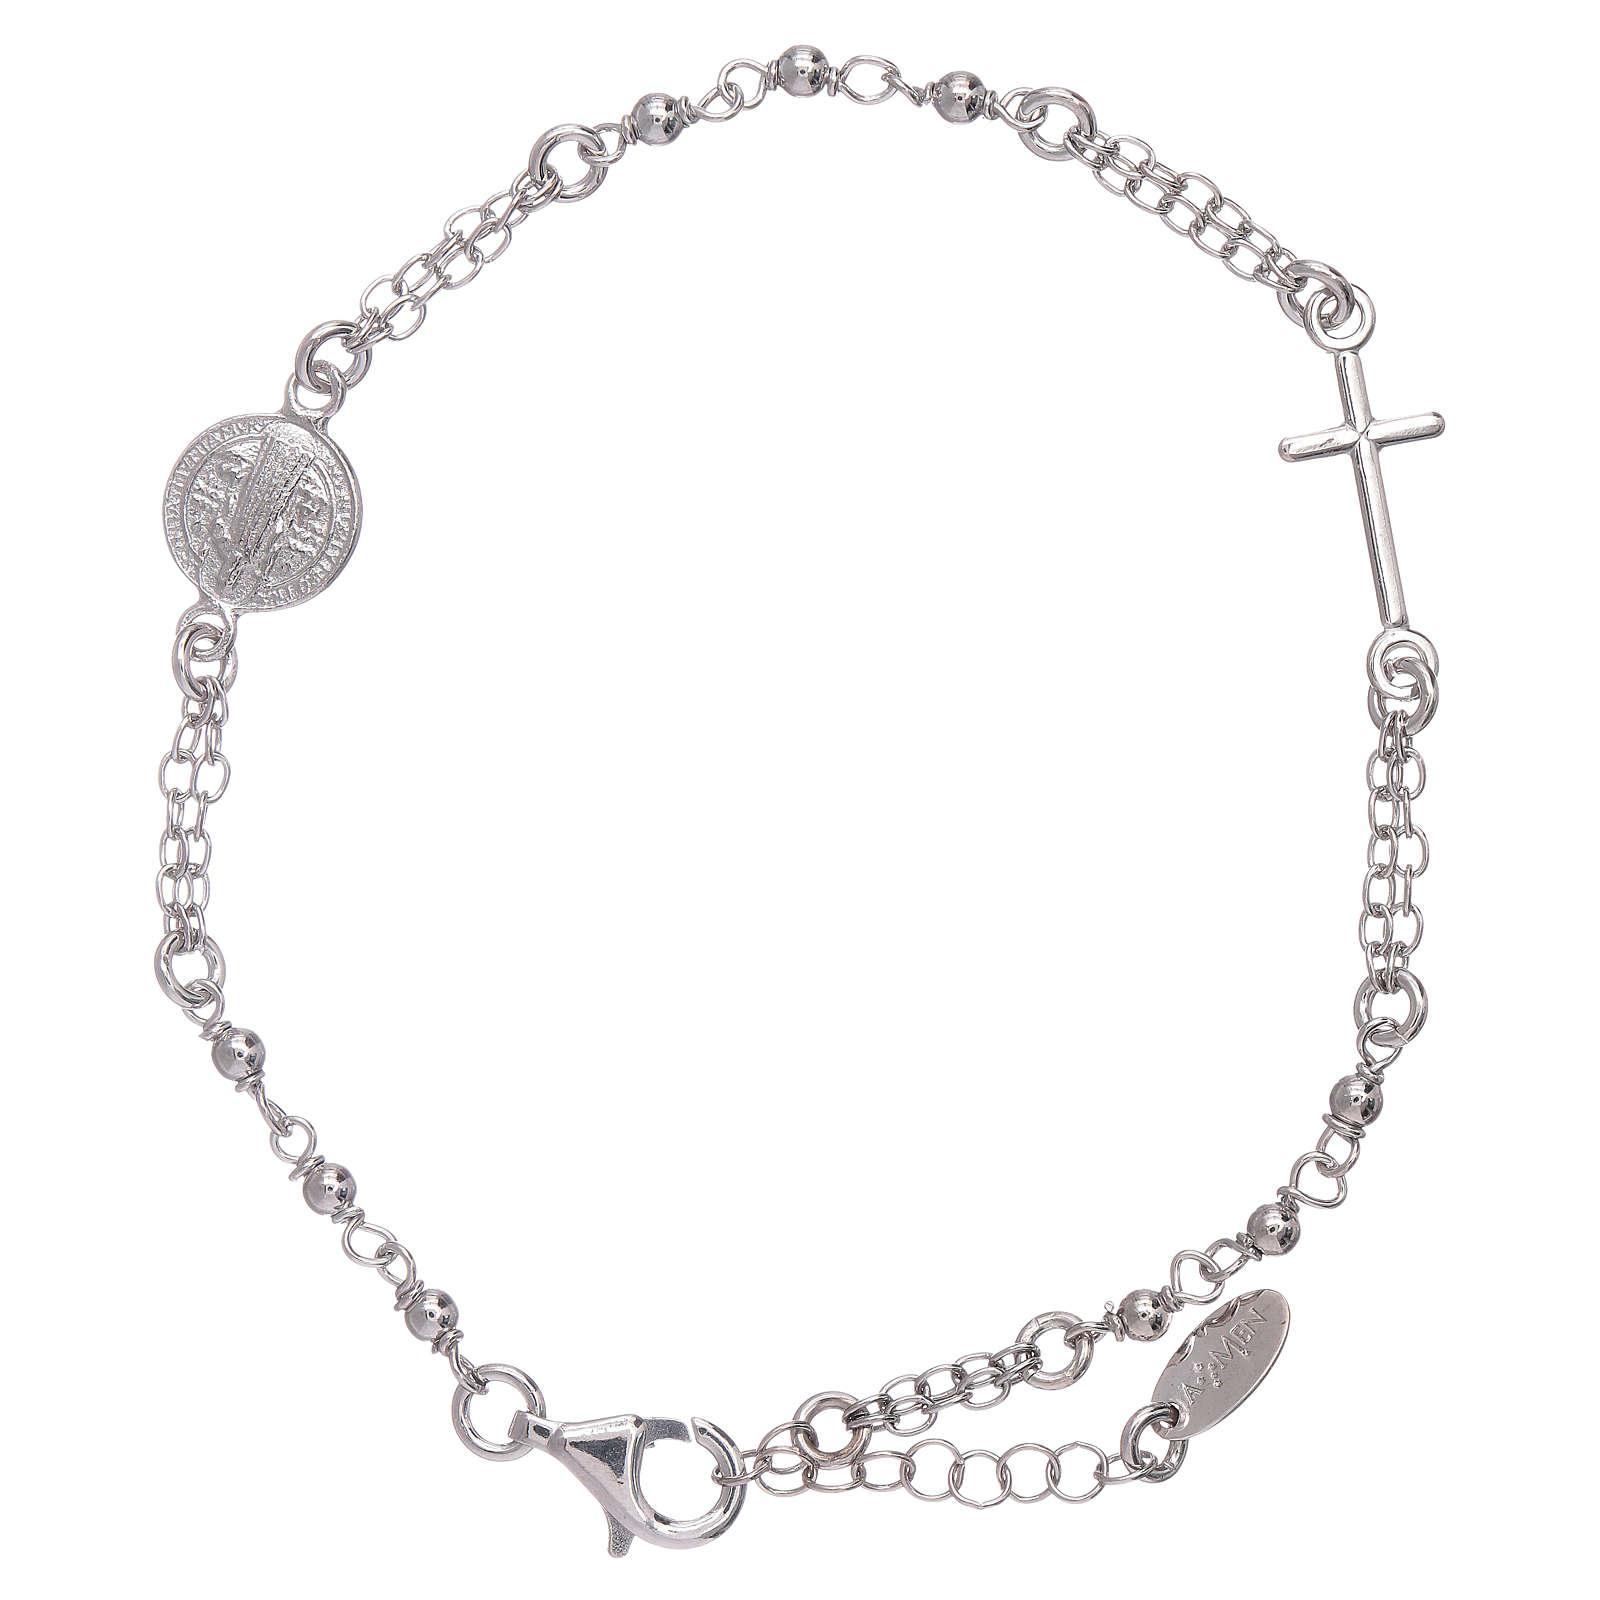 Bracelet chapelet AMEN Saint Benoît argent 925 rhodium 4